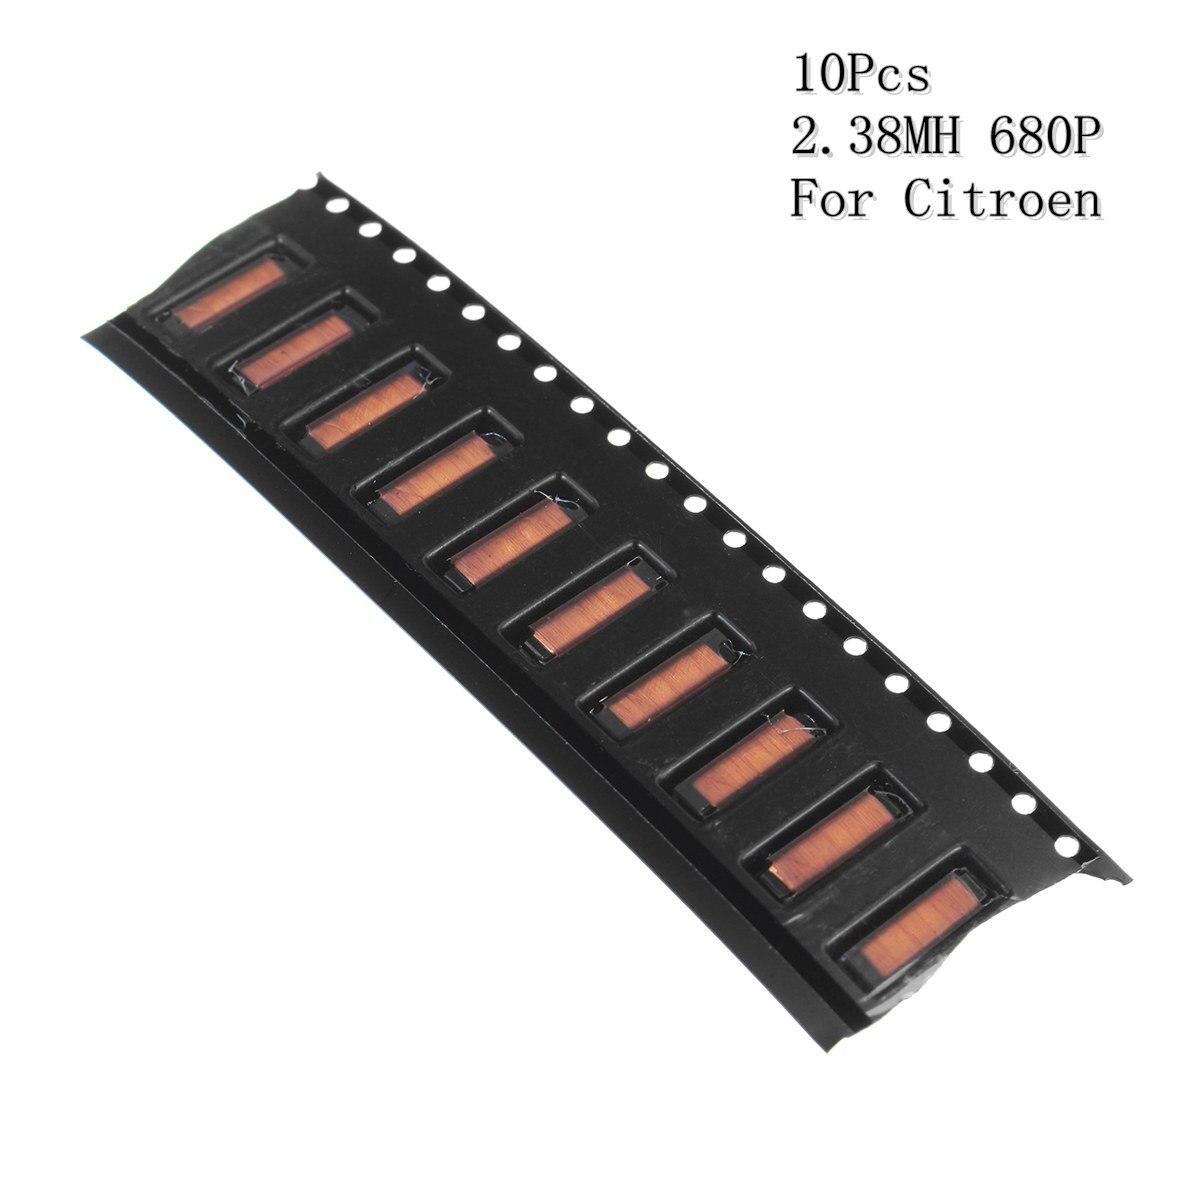 10pcs 2.38MH 680P Car Remote Key Repair Transformer